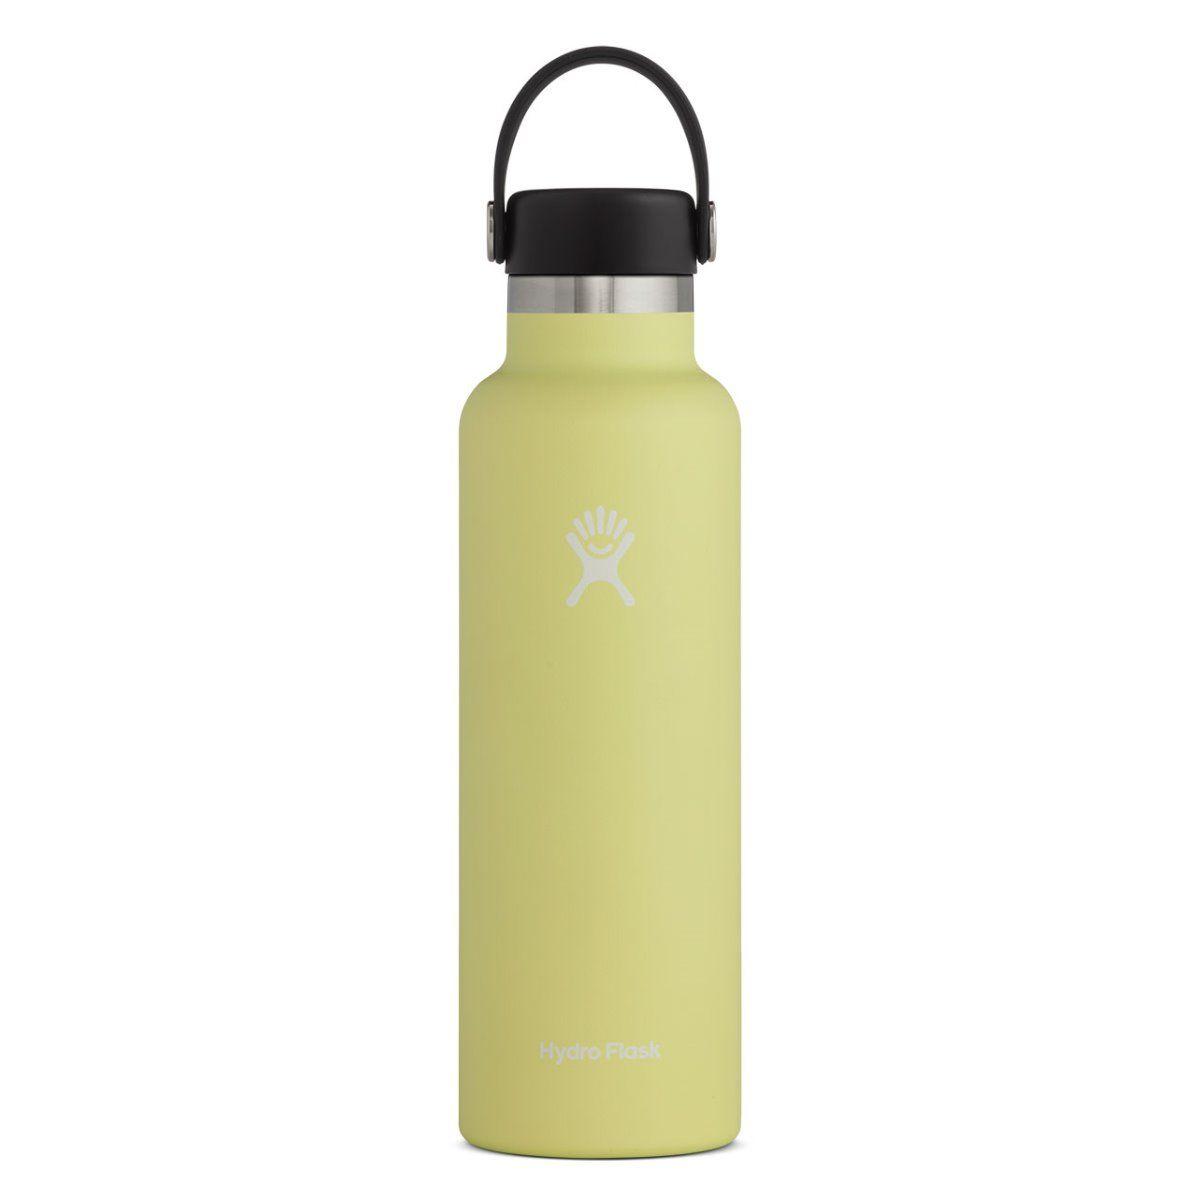 Hydroflask 21 oz standard cap pineapple